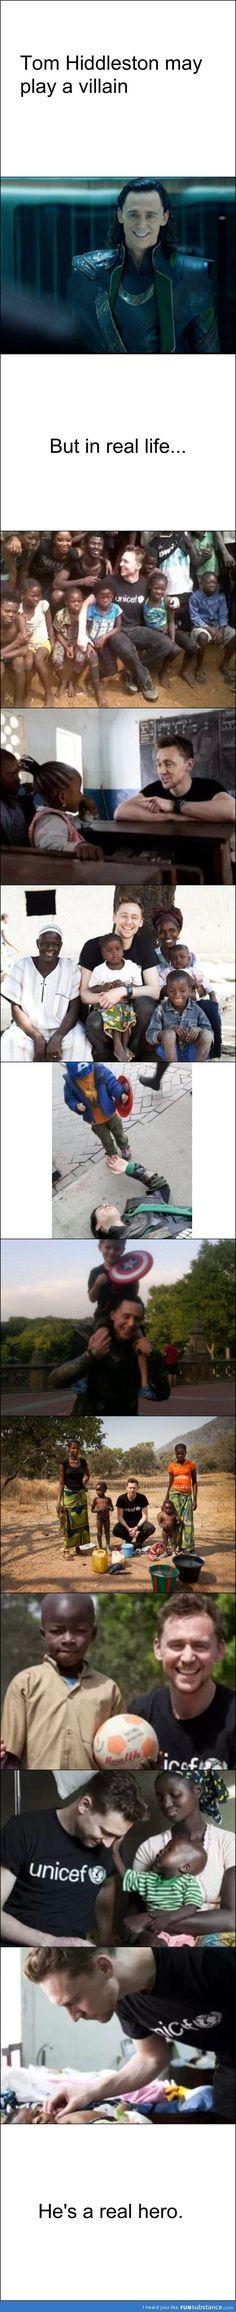 Tom Hiddleston. Meu herói.